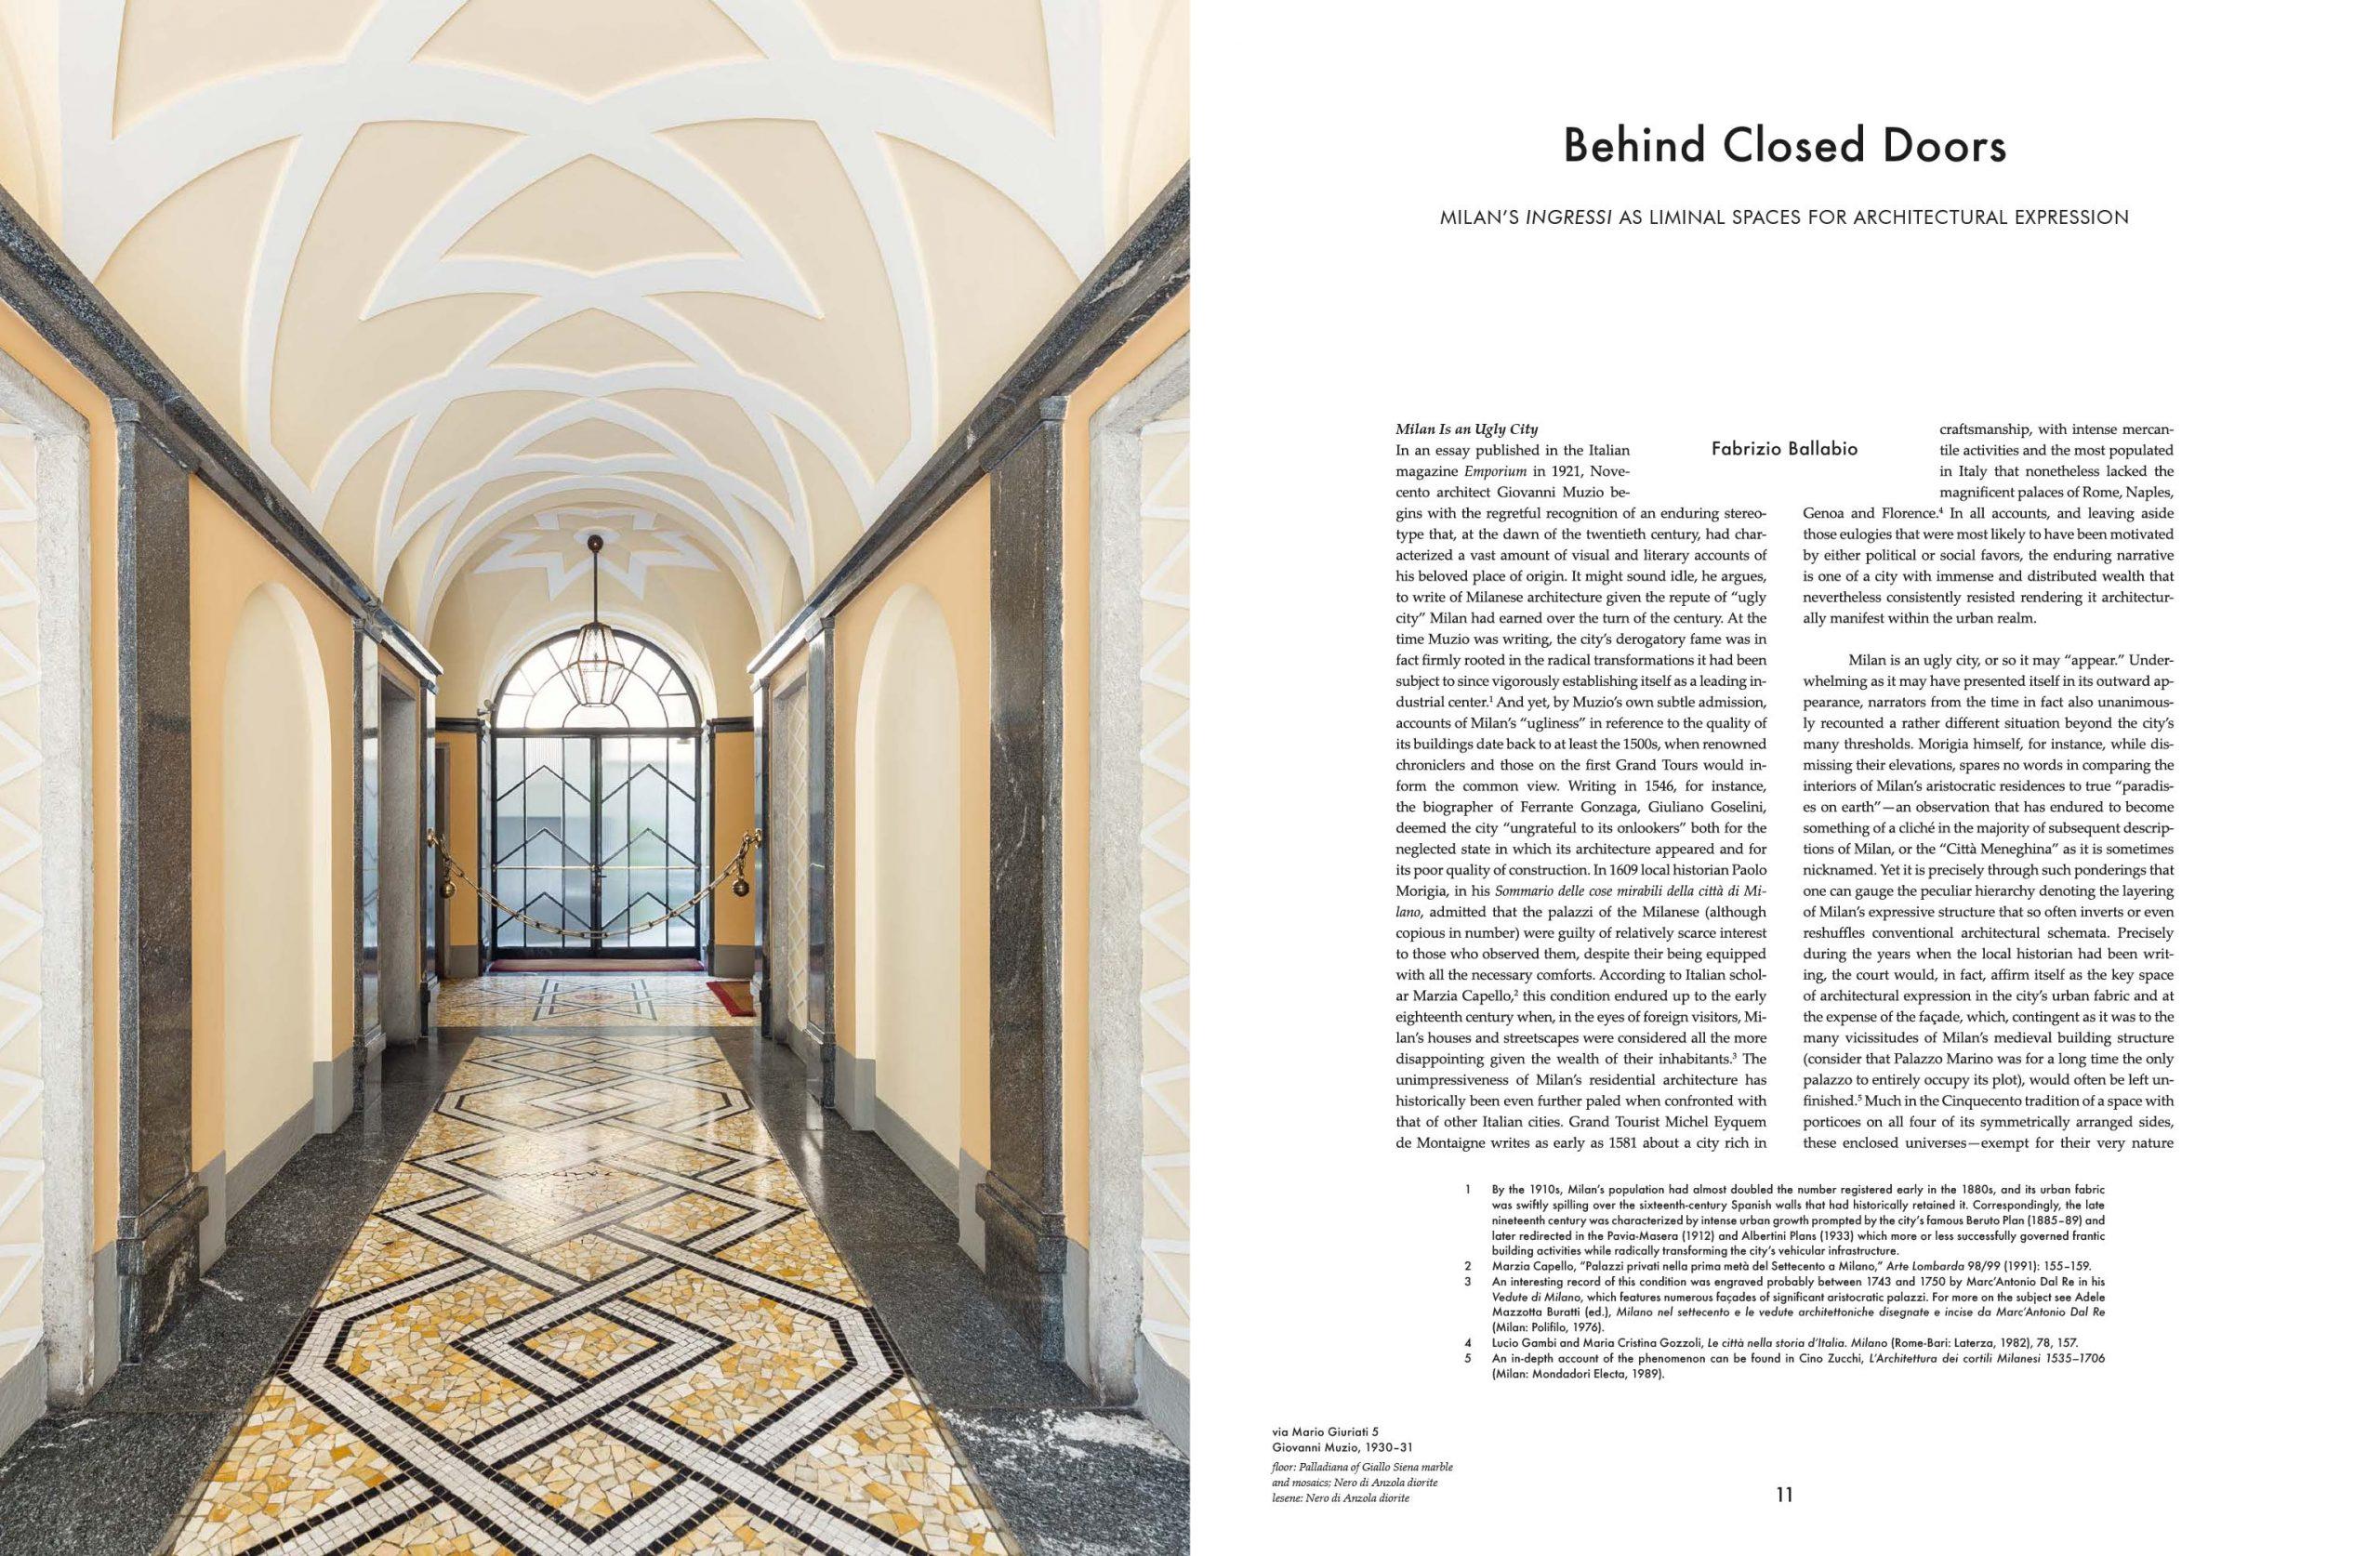 nicoletta-dalfino-karl-kolbitz-entryways-of-milan-taschen-pp10-11-scaled